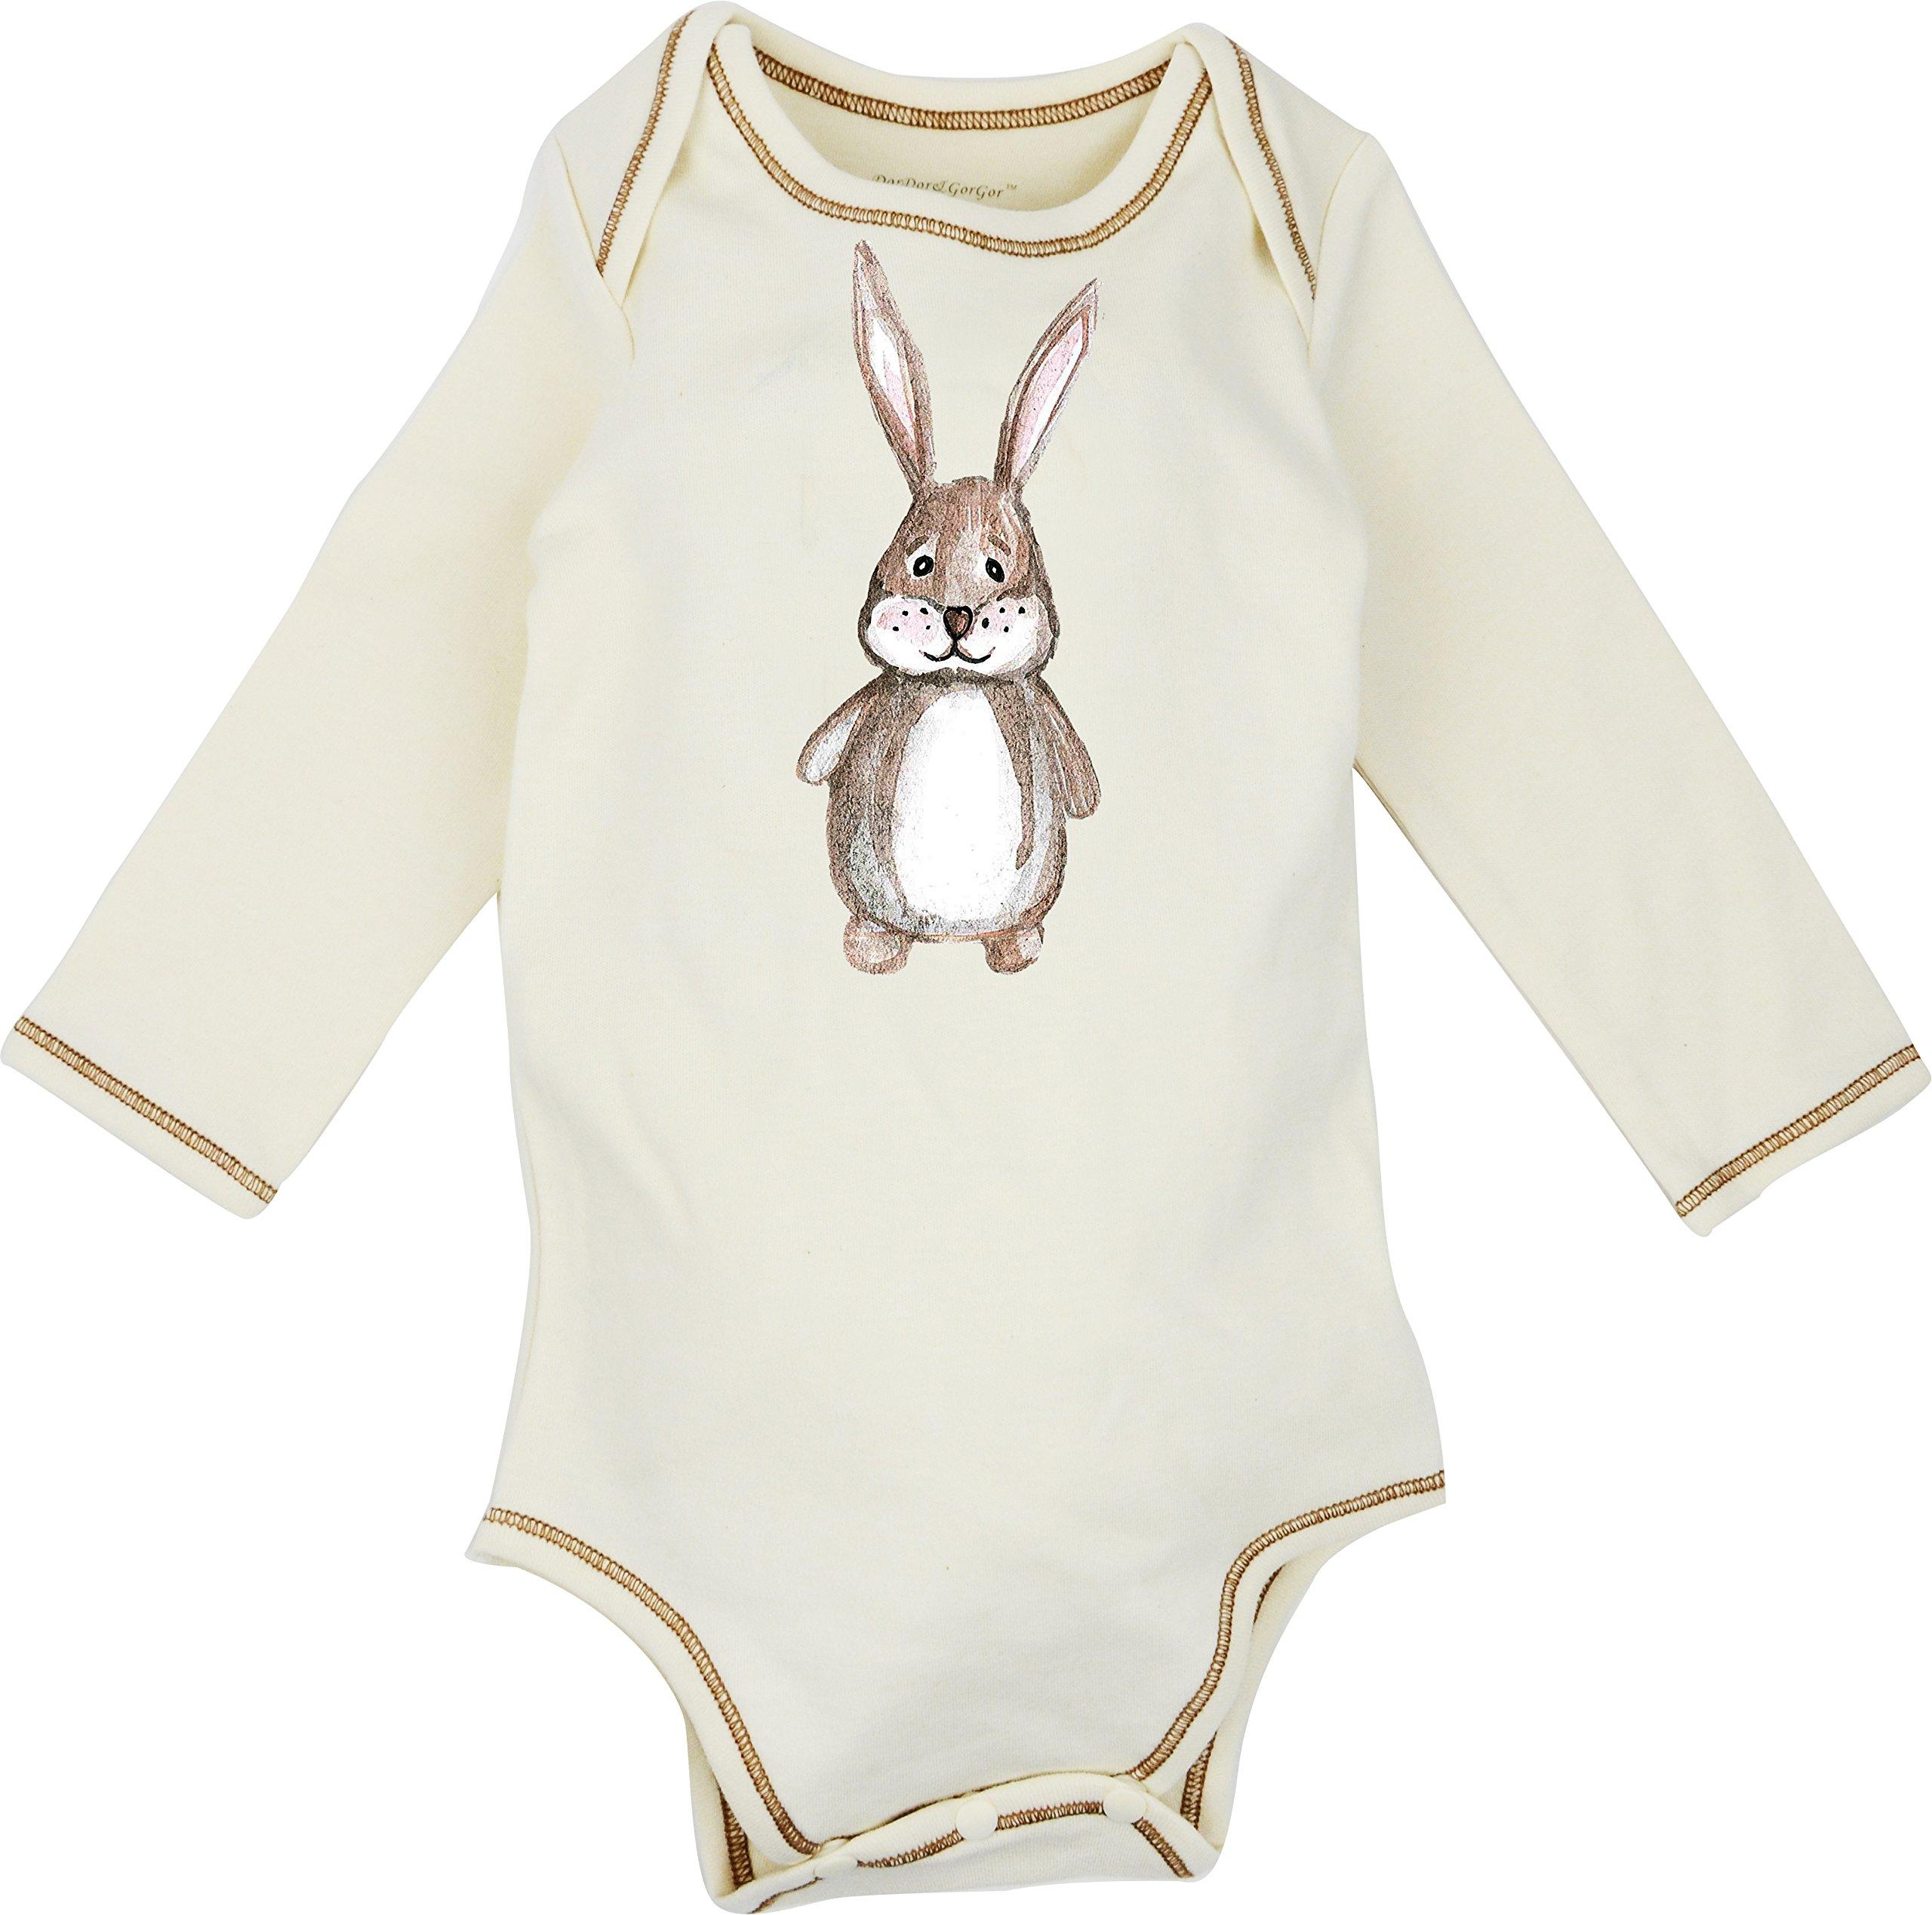 100% Organic Cotton Long Sleeve Unisex Baby Onesie w/Plant Dye Imprints (3M, Bunny)